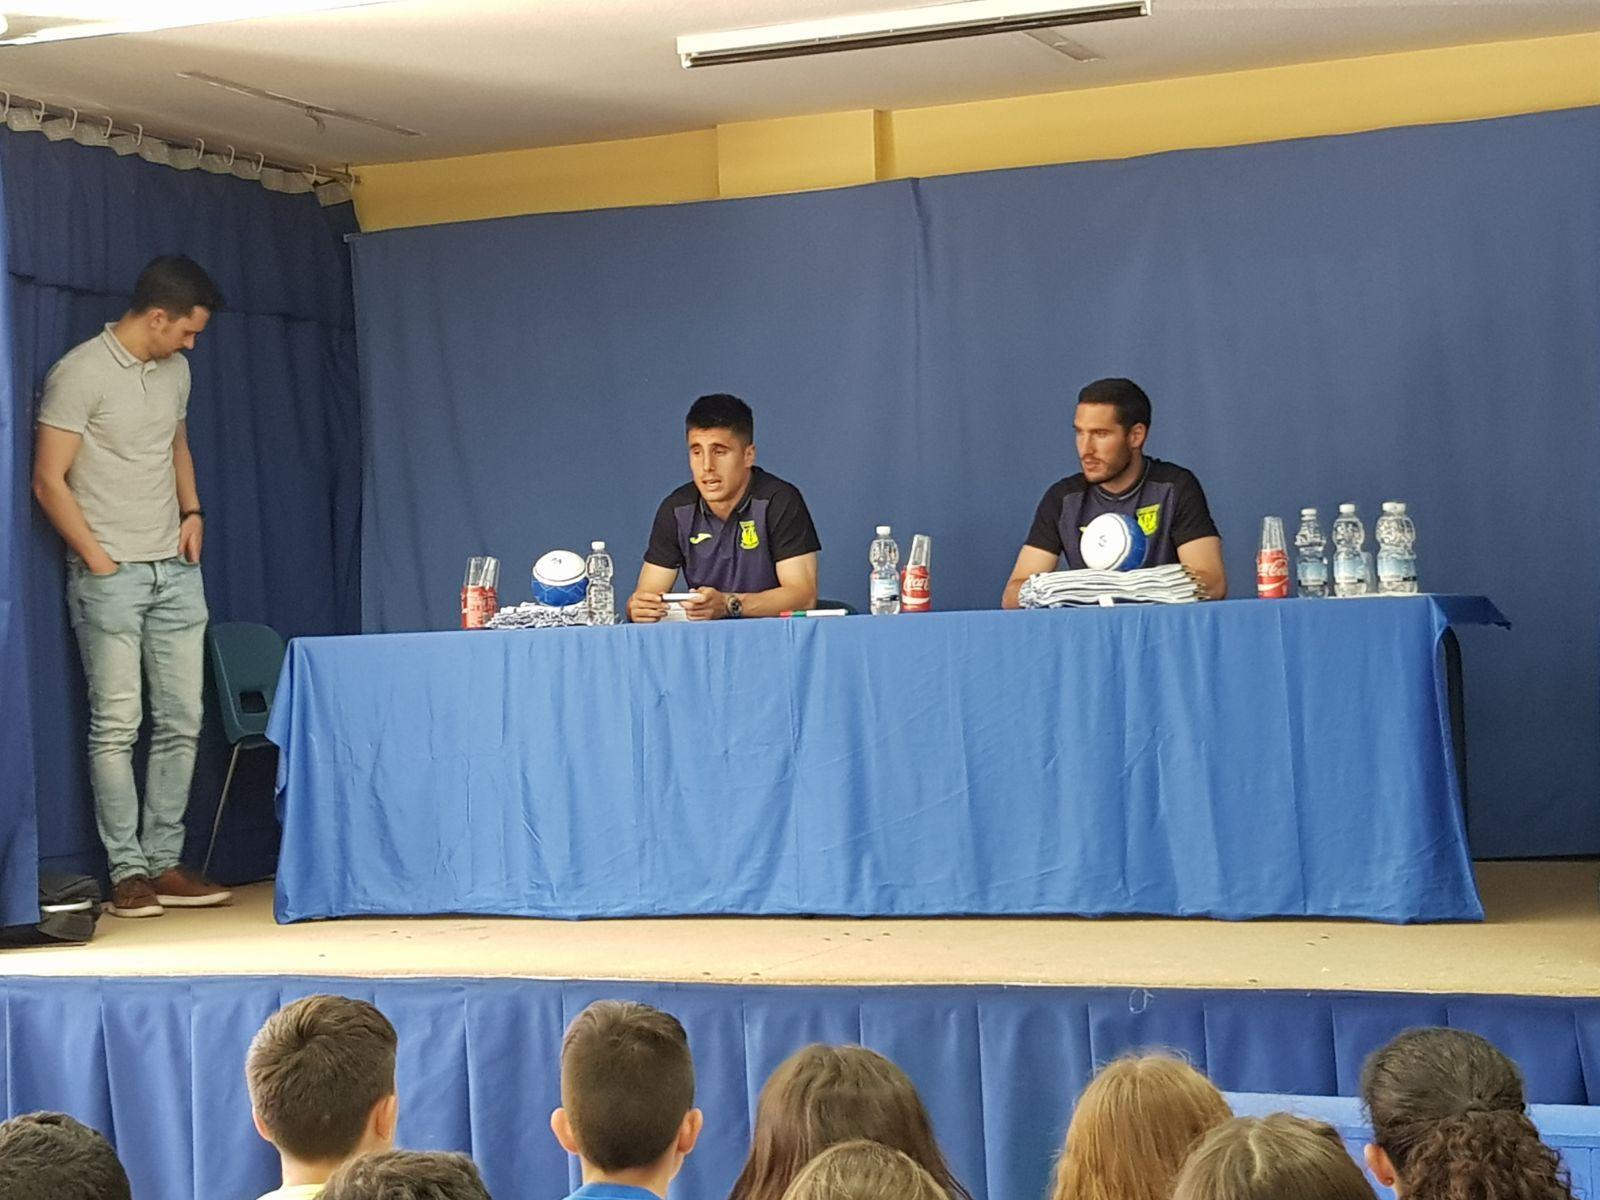 Los jugadores del C.F. Leganés visitan el cole 8